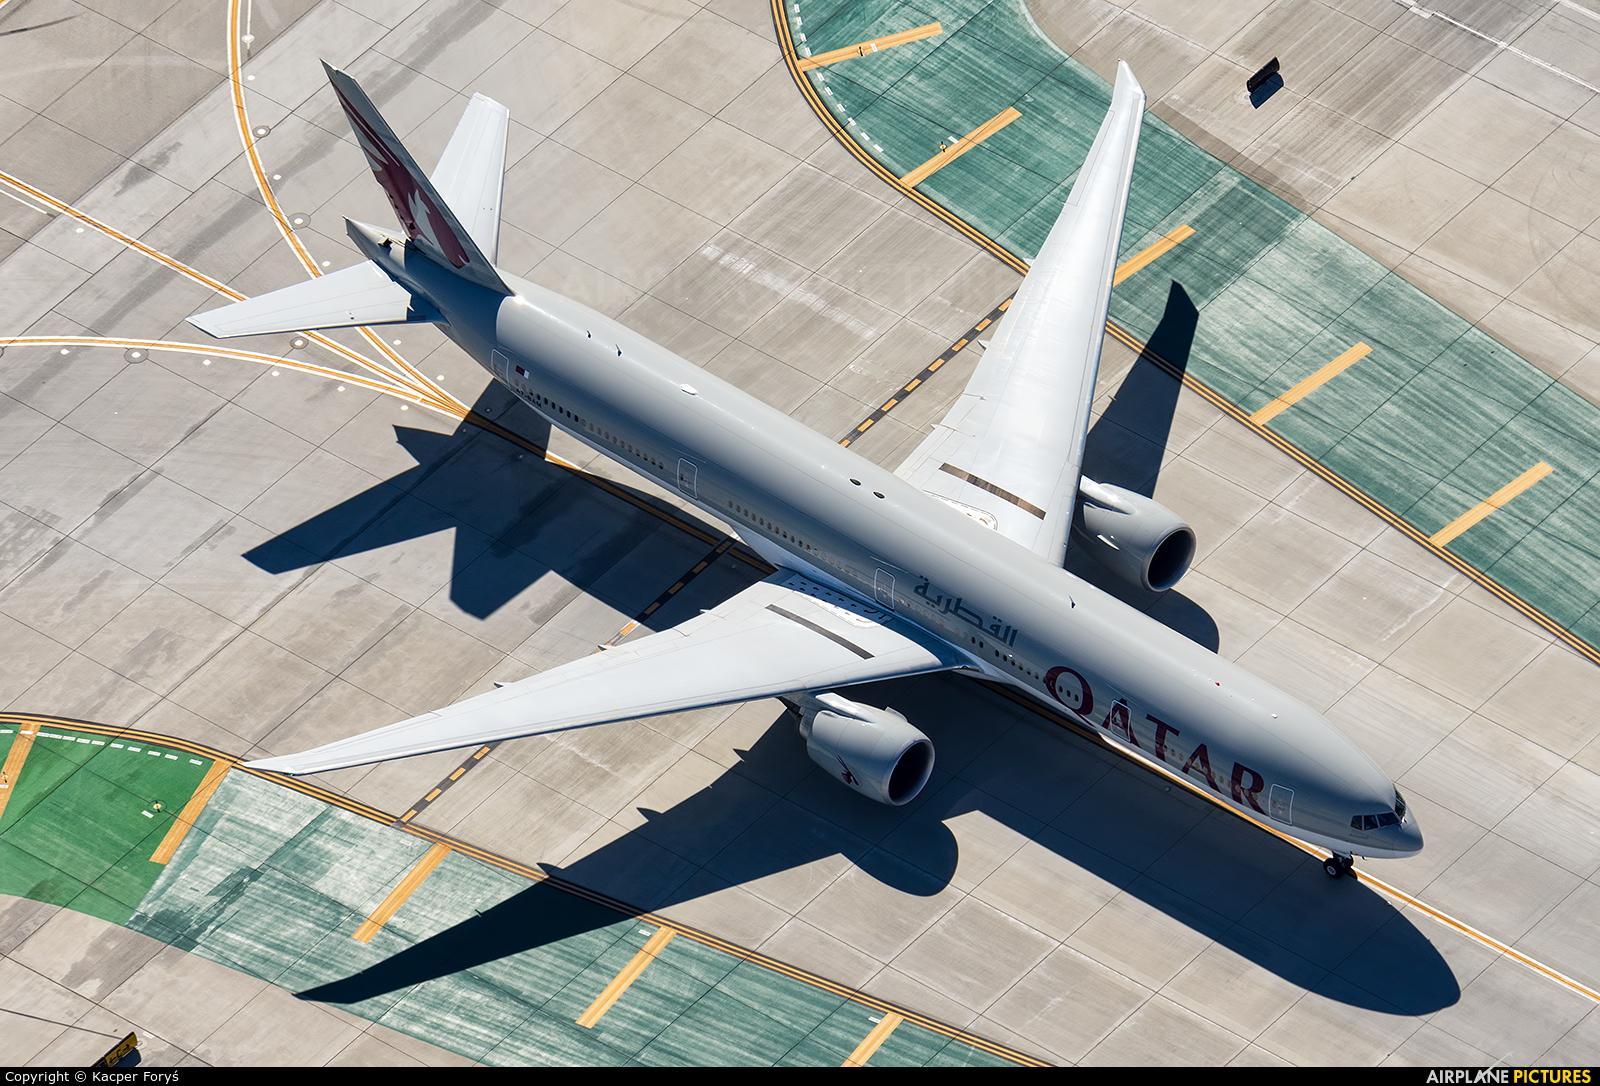 Qatar Airways A7-BAM aircraft at Los Angeles Intl